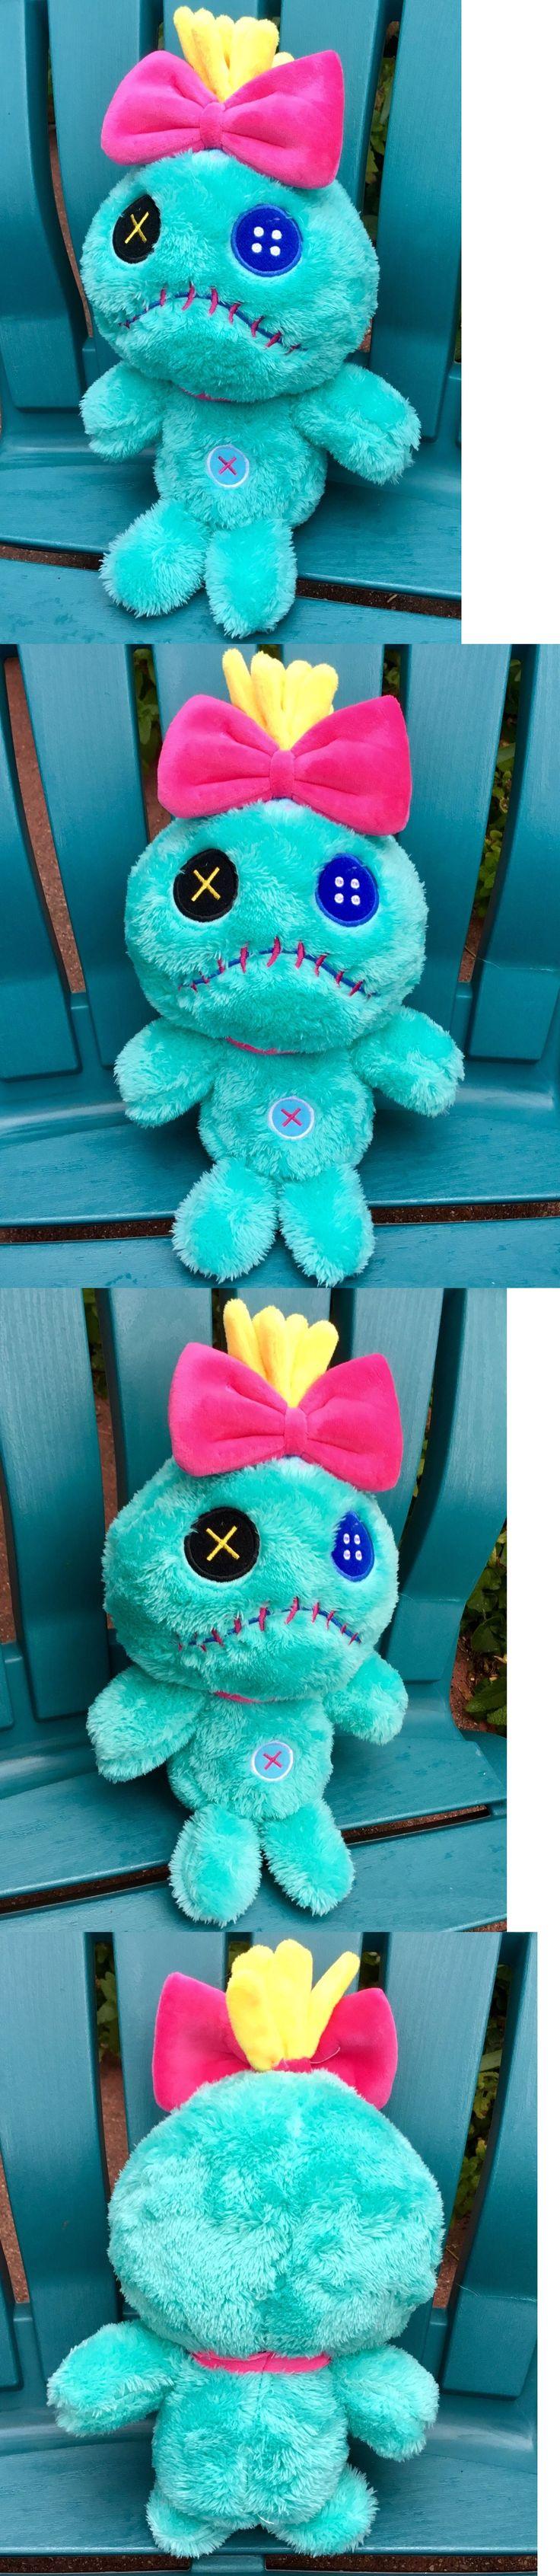 Lilo and Stitch 44035: New 14 Disney Lilo And Stitch Scrump Plush Stuffed Animal Doll Figure Soft Toy -> BUY IT NOW ONLY: $37.99 on eBay!